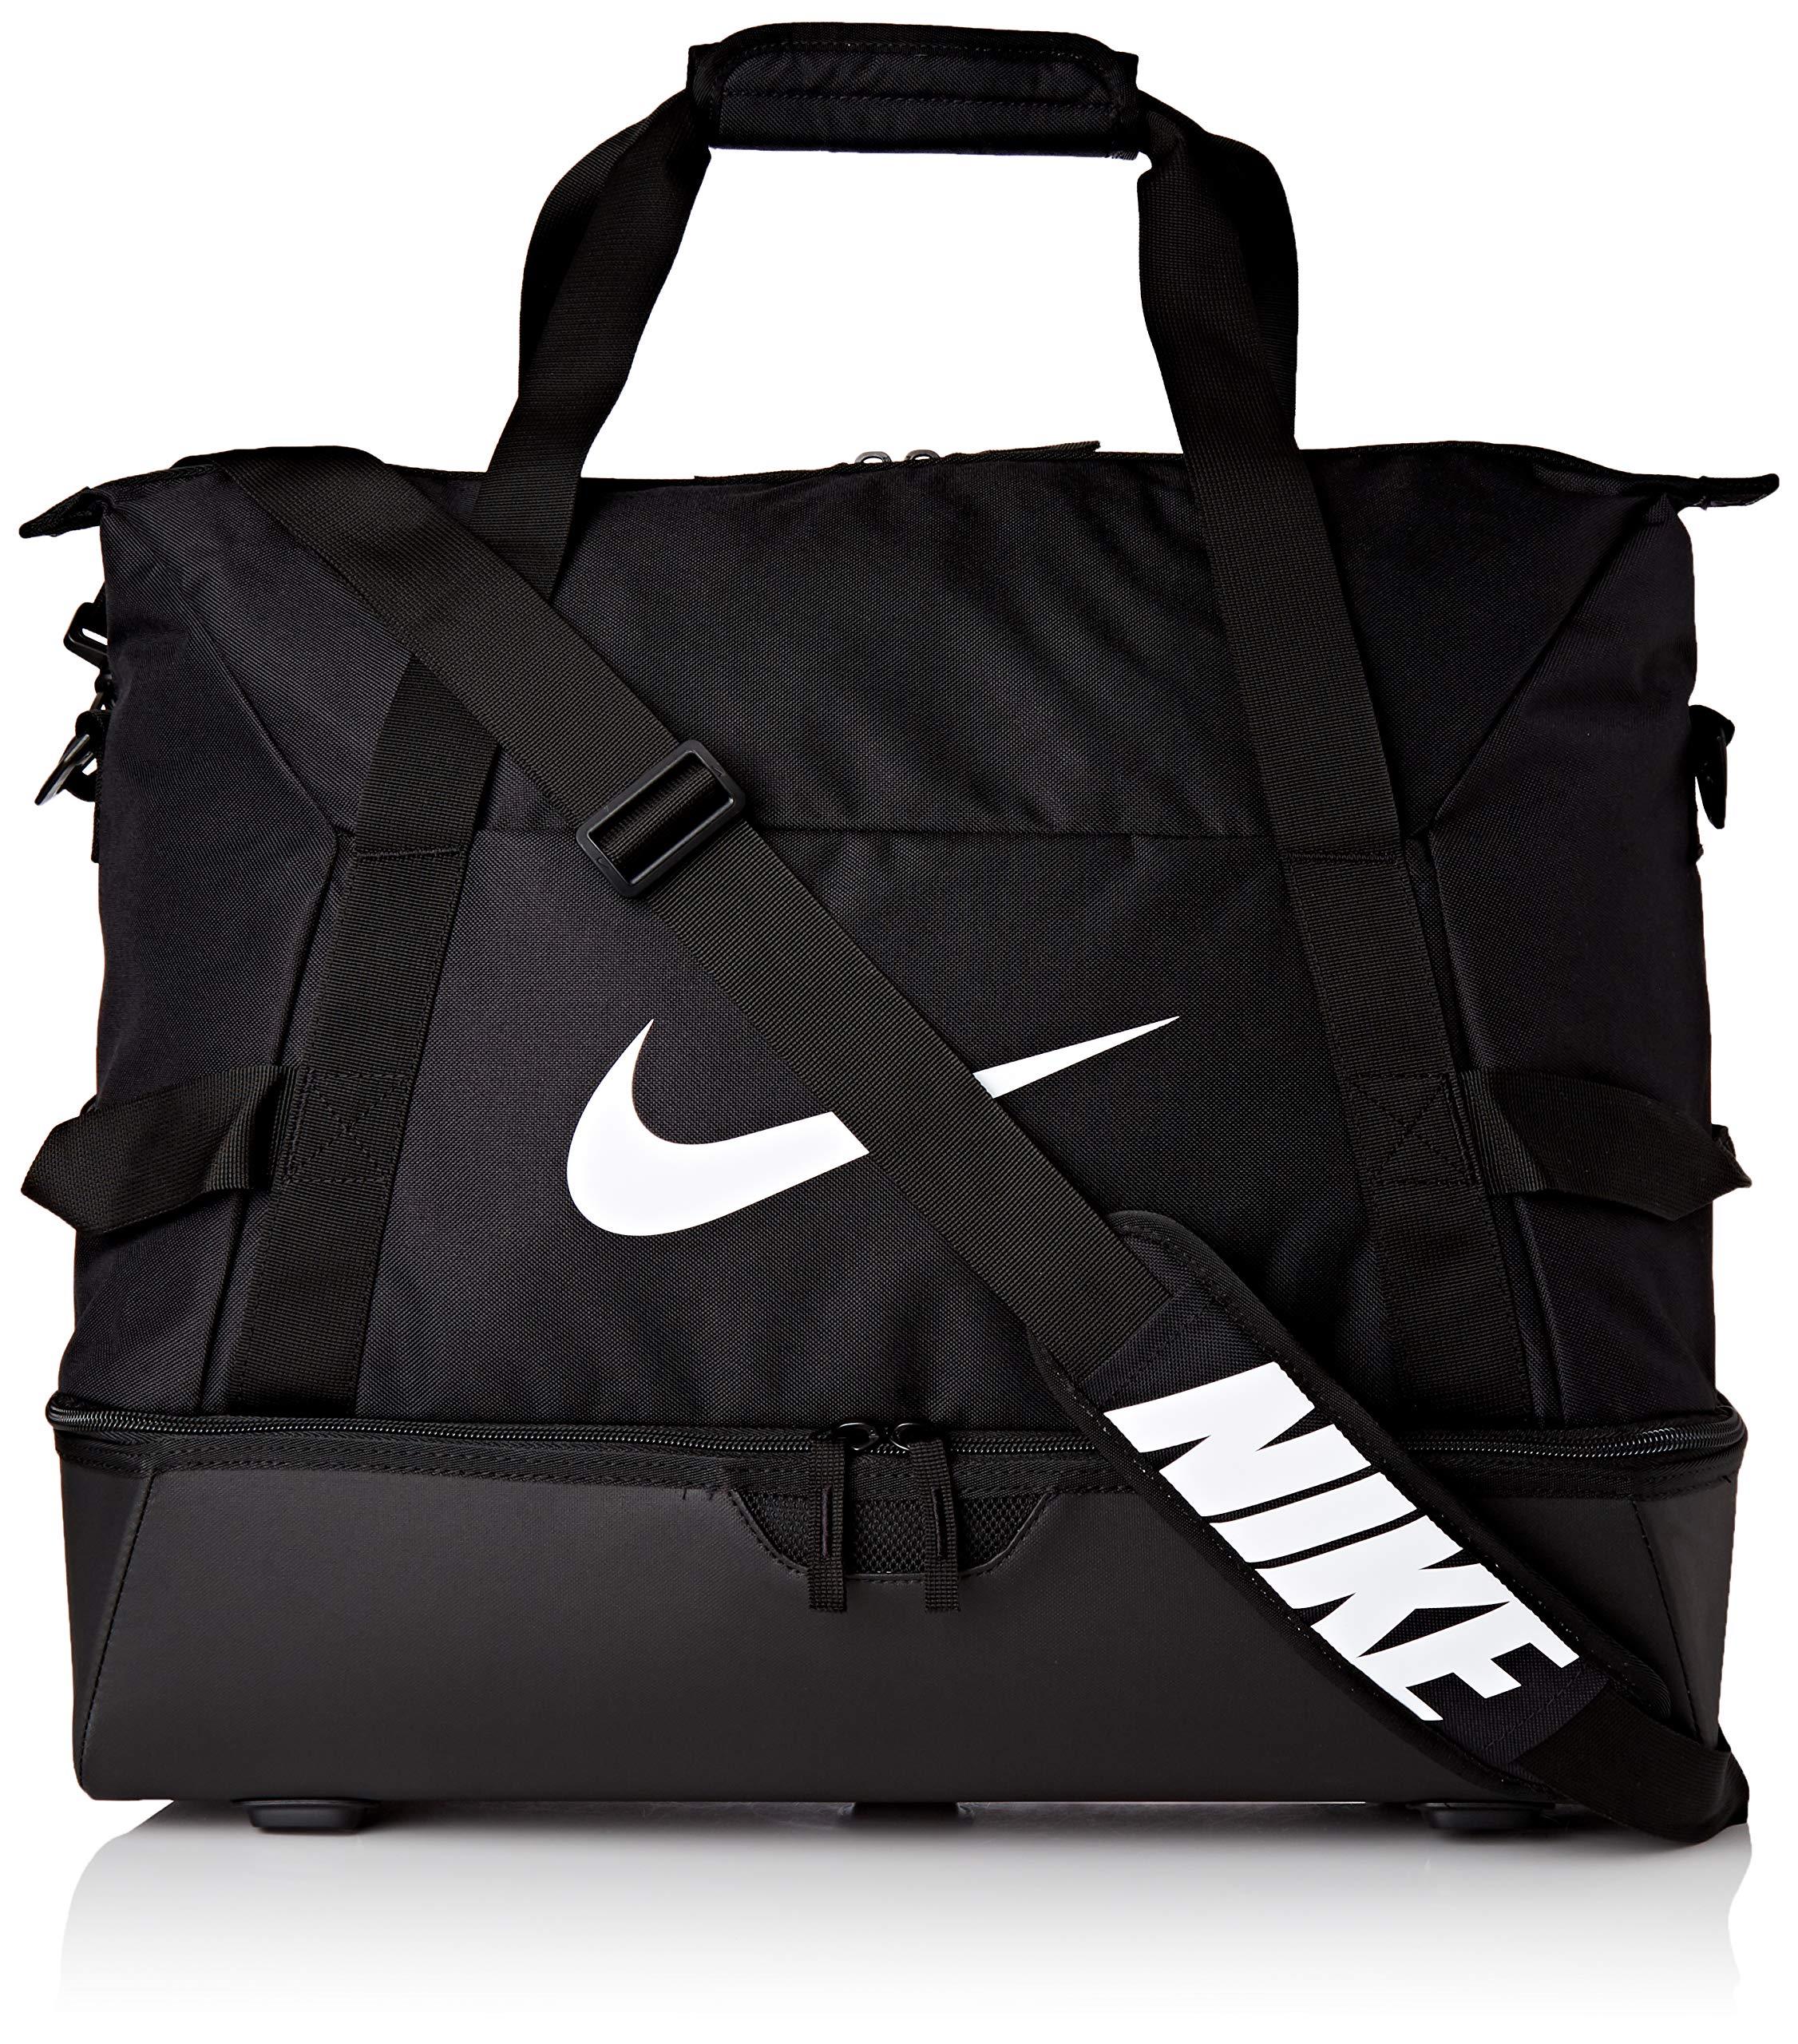 Nike Unisex Academy Team Hardcase Large Sporttasche, Black/Black/White, 50 x 33